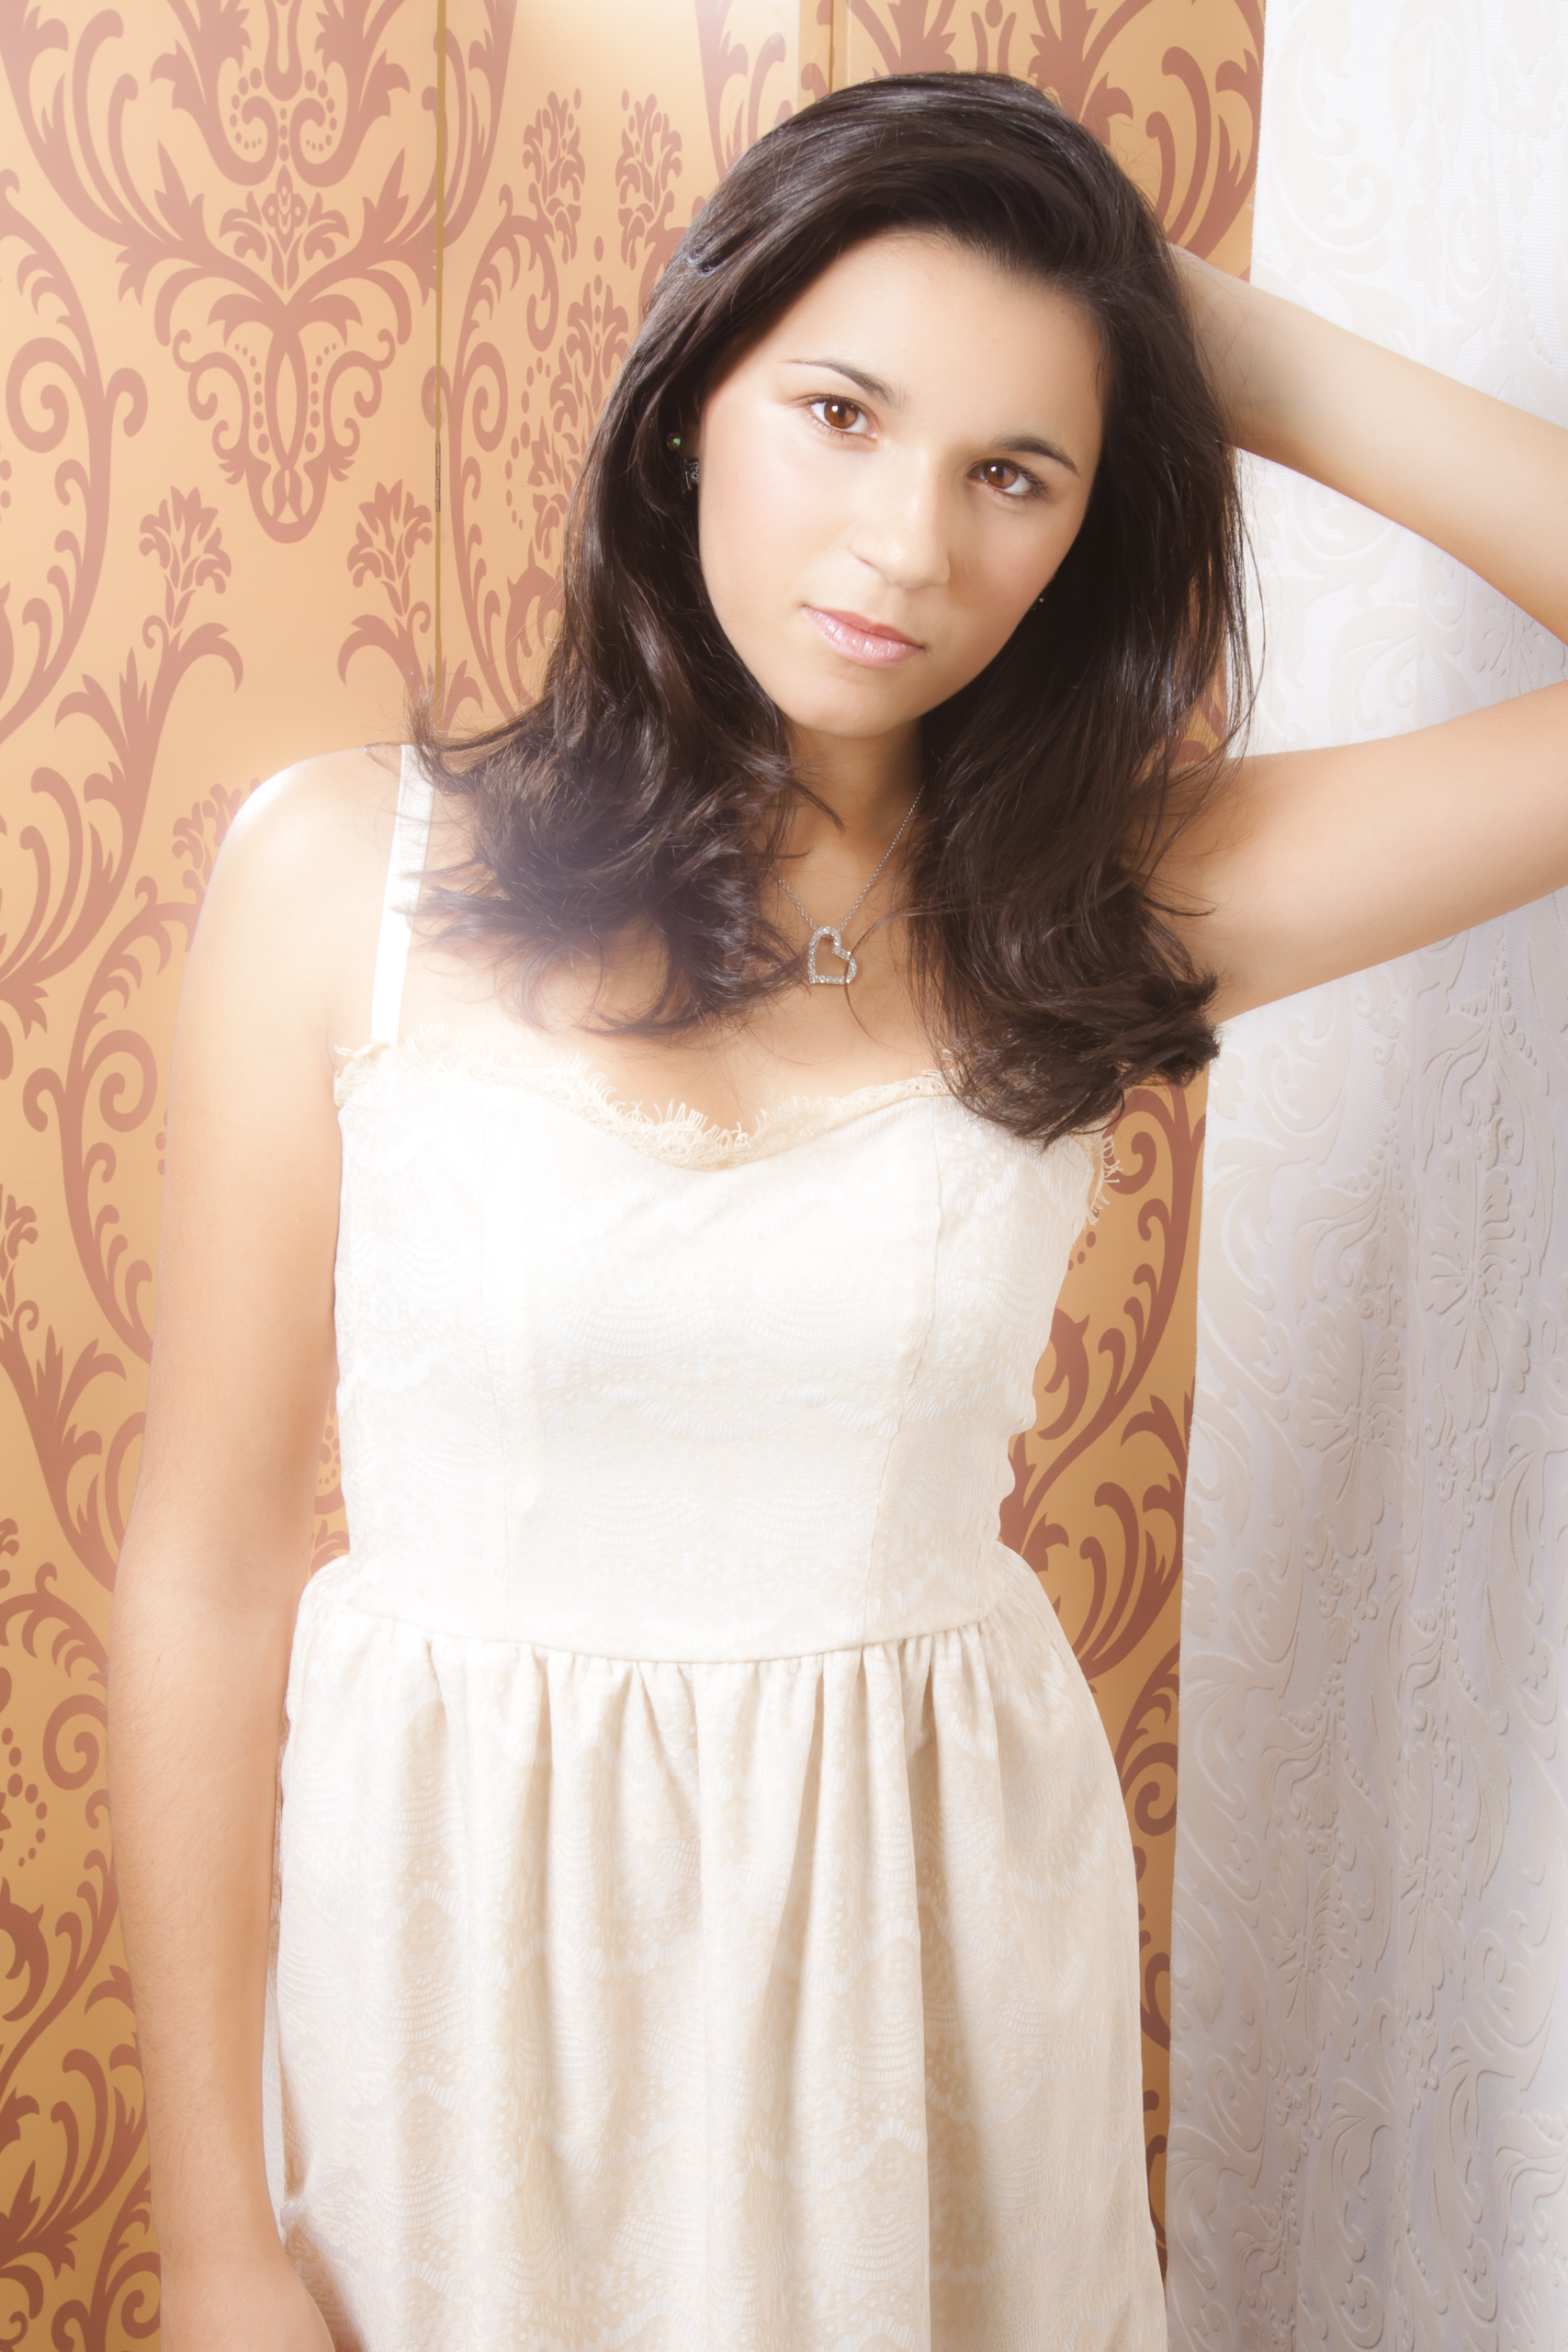 04 modern styled magazine cover senior portrait sessions in white lace dress 8527.jpg